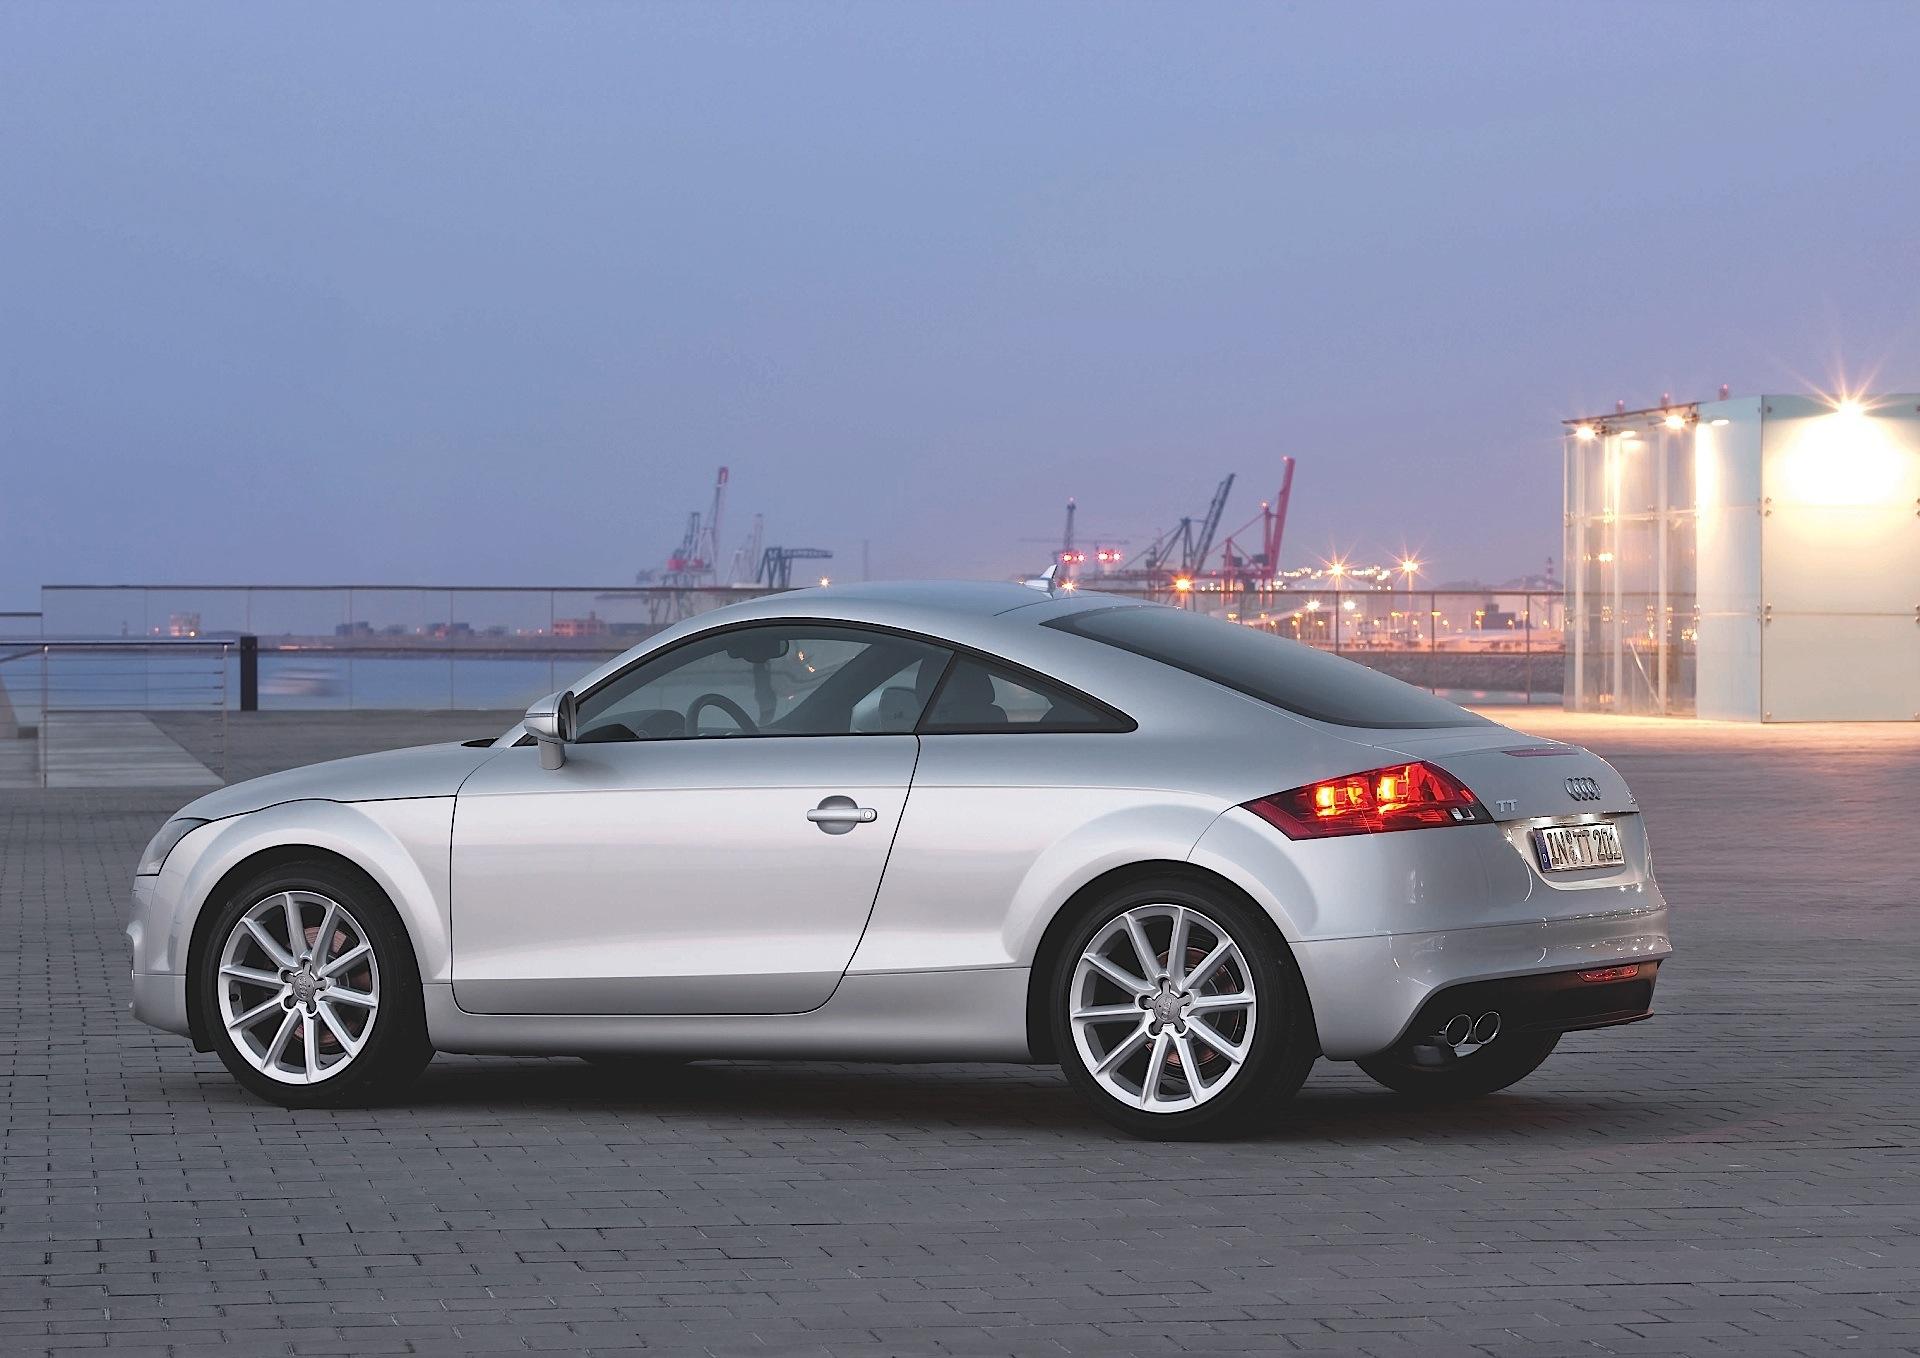 Audi TT Models and History – Las Vegas TT Club